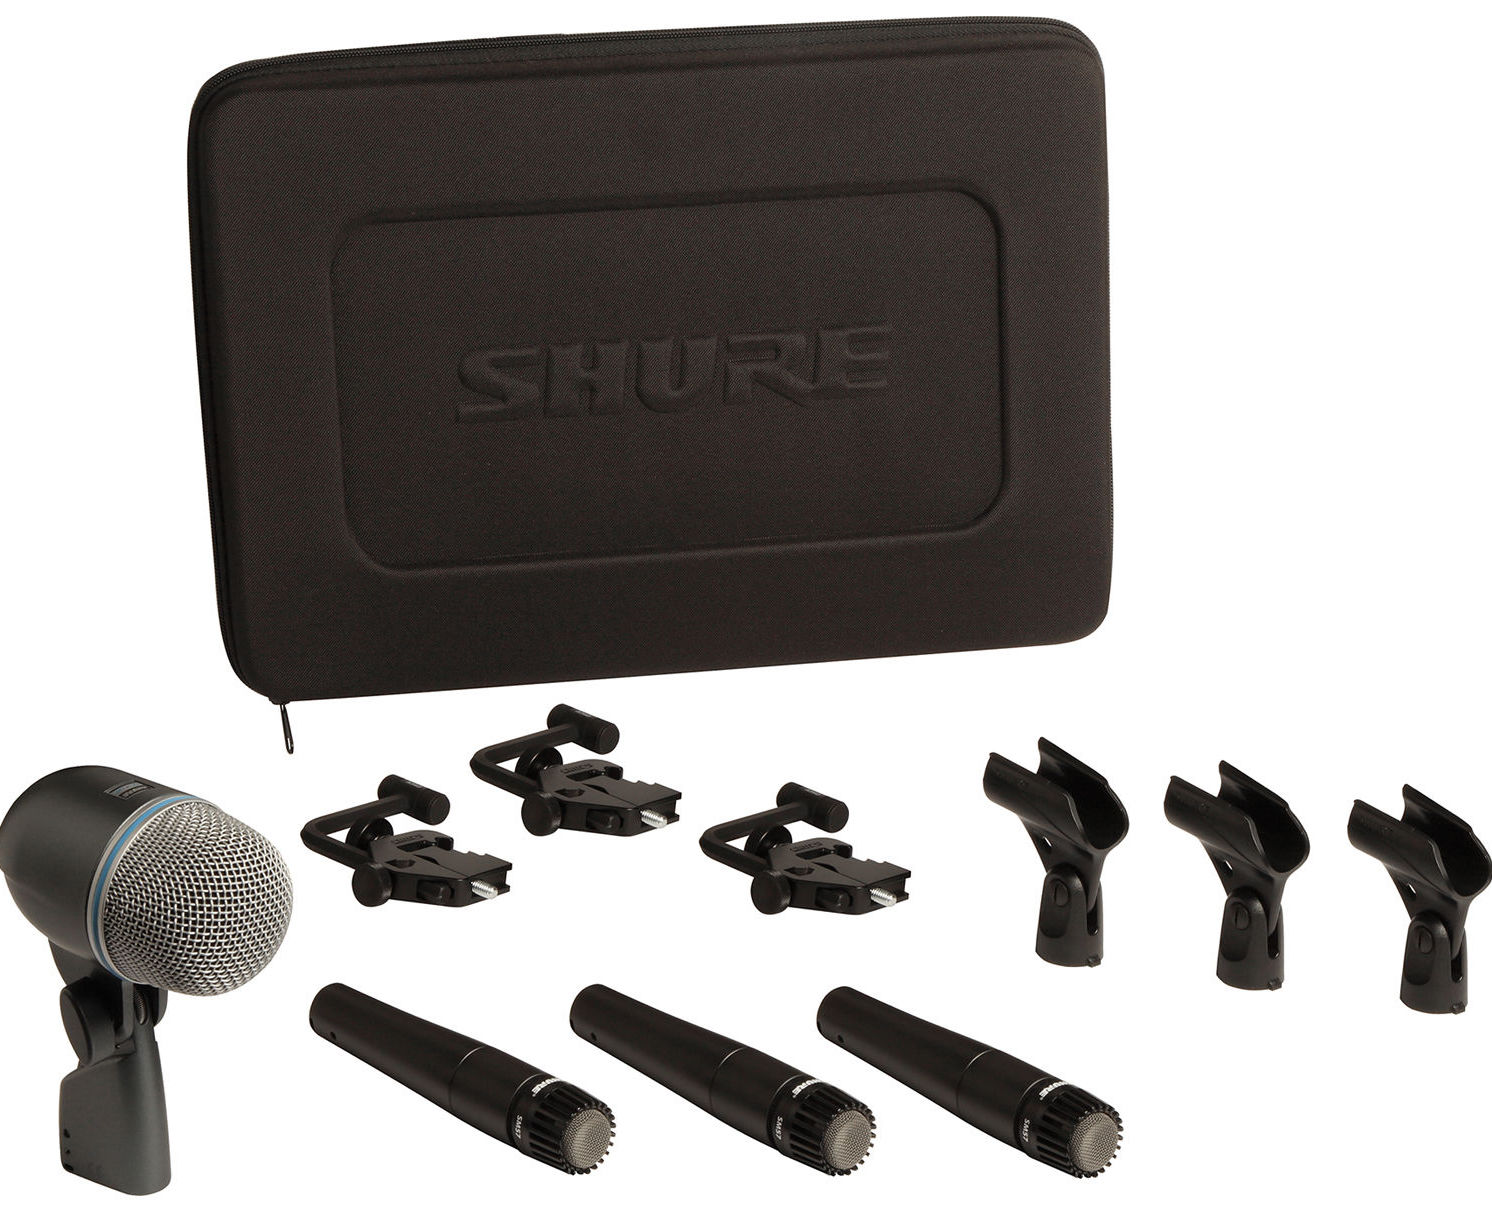 shure-dmk57-52-drum-microphone-kit.jpeg